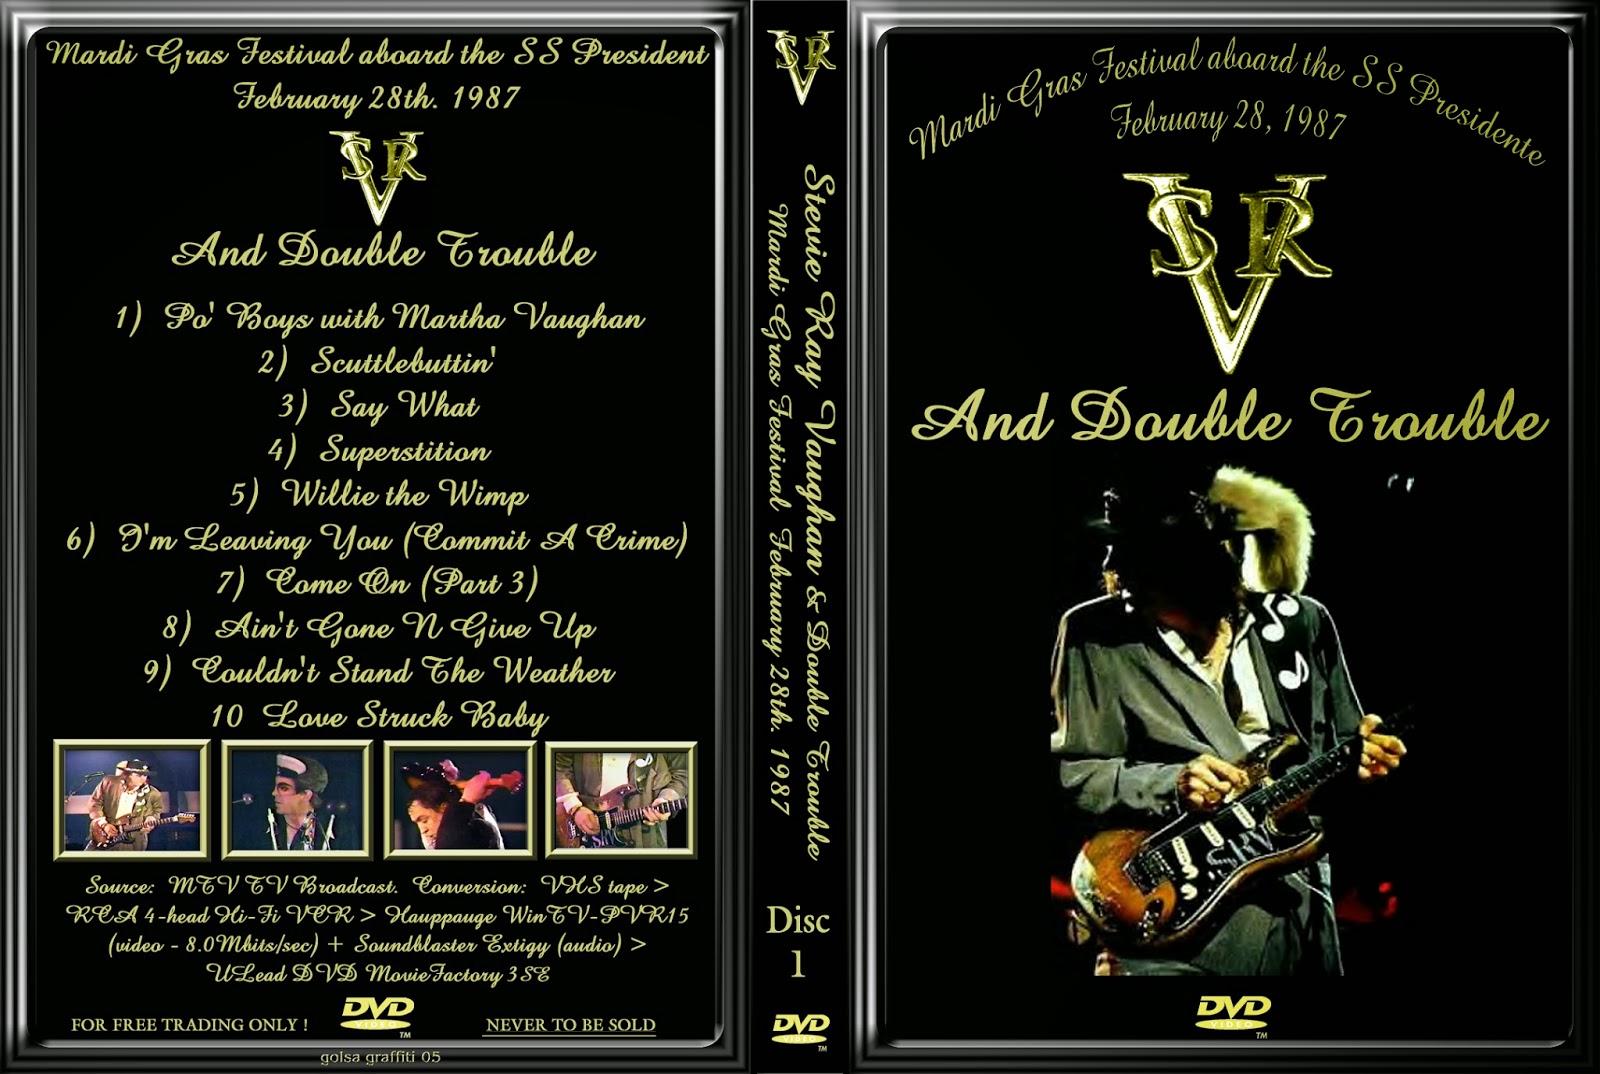 TUBE Stevie Ray Vaughan